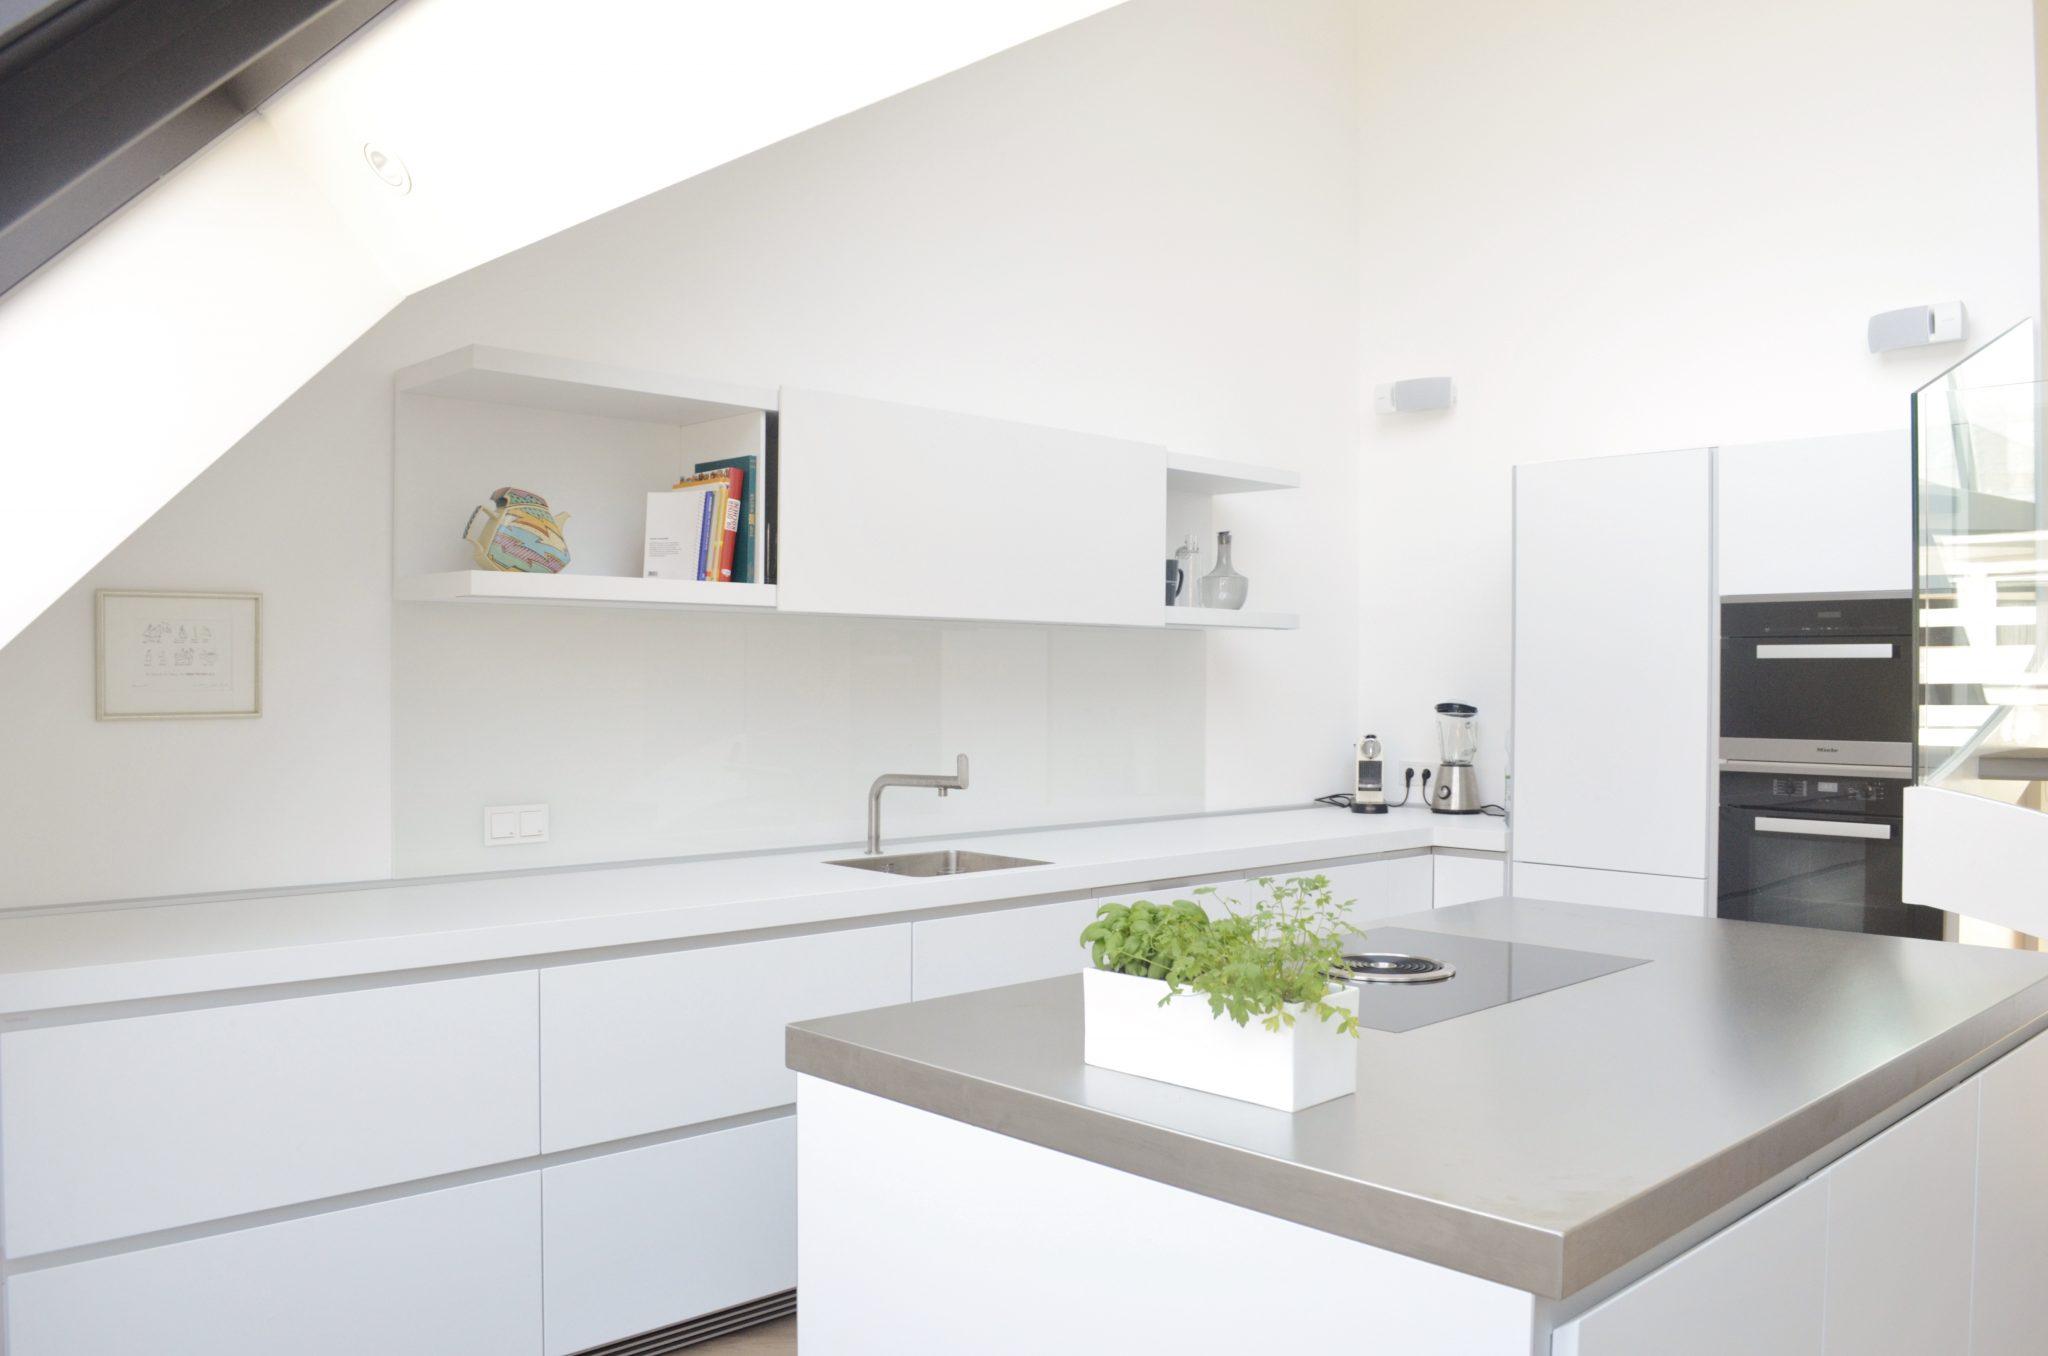 homestory vienna loft zuhause bei jakob. Black Bedroom Furniture Sets. Home Design Ideas